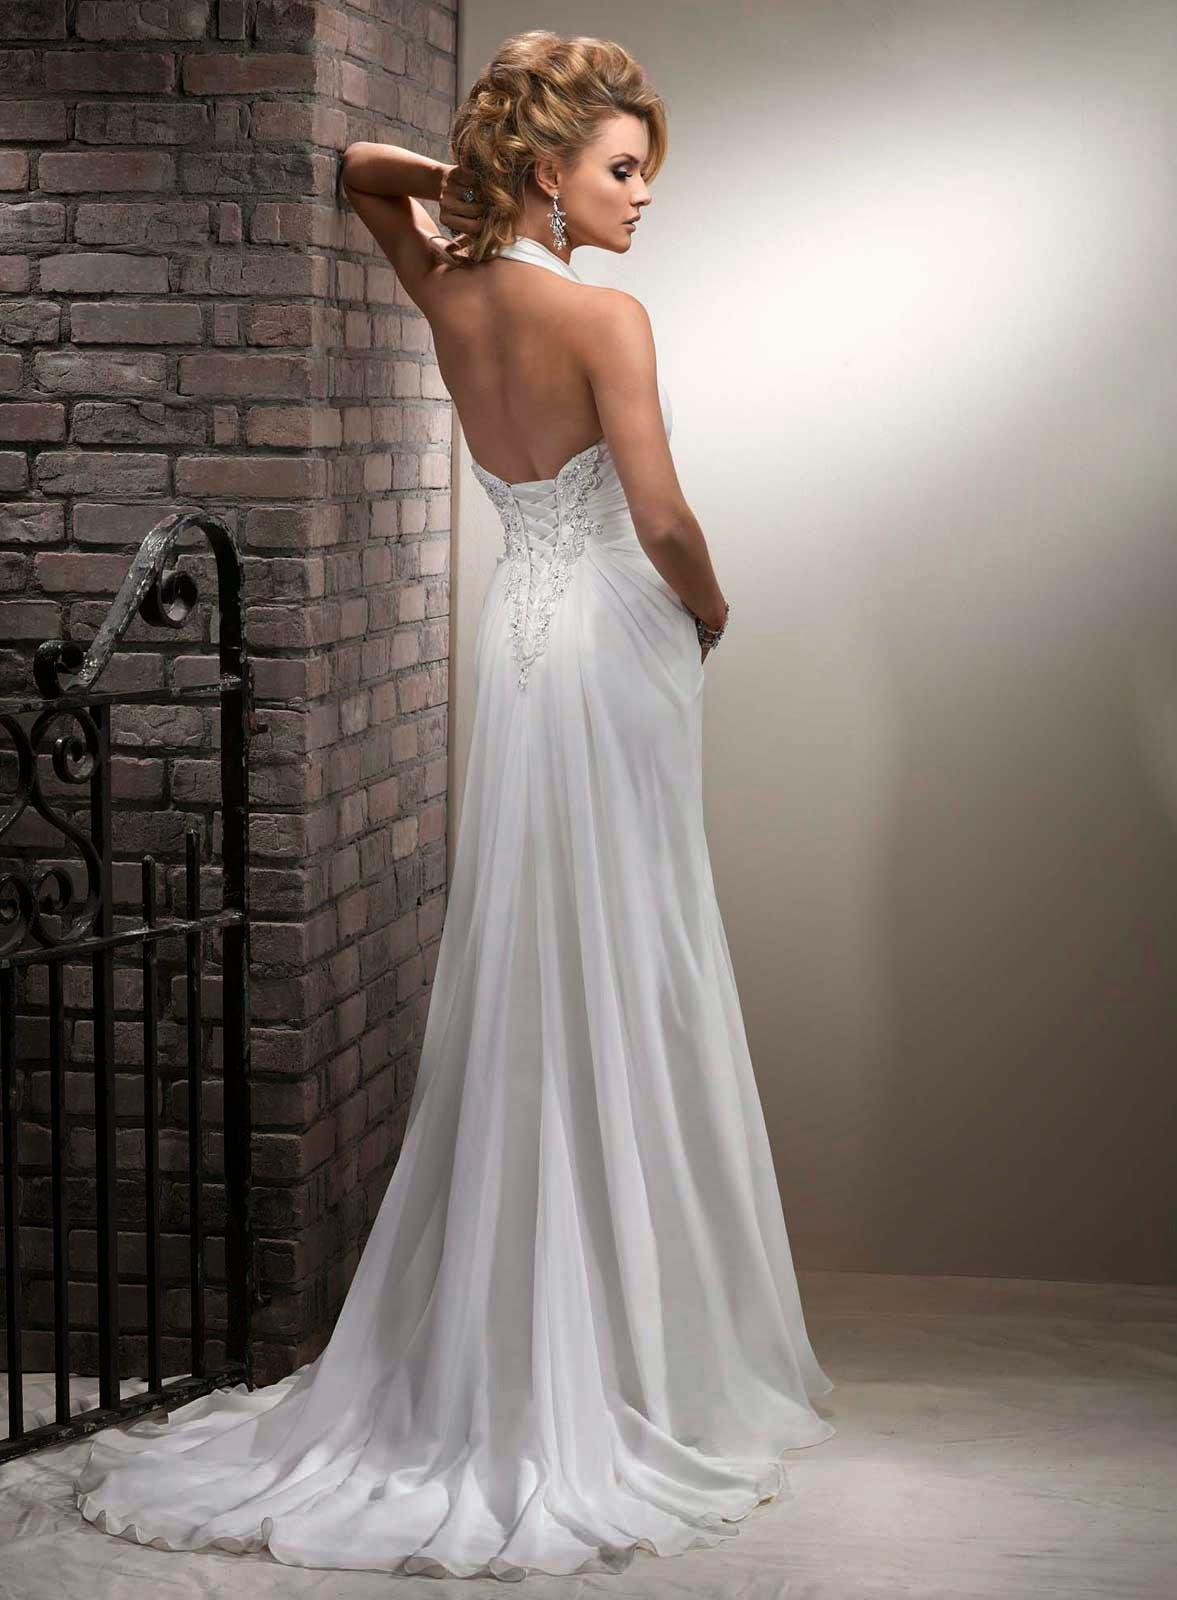 Casual Wedding Dresses Ideas For Older Brides